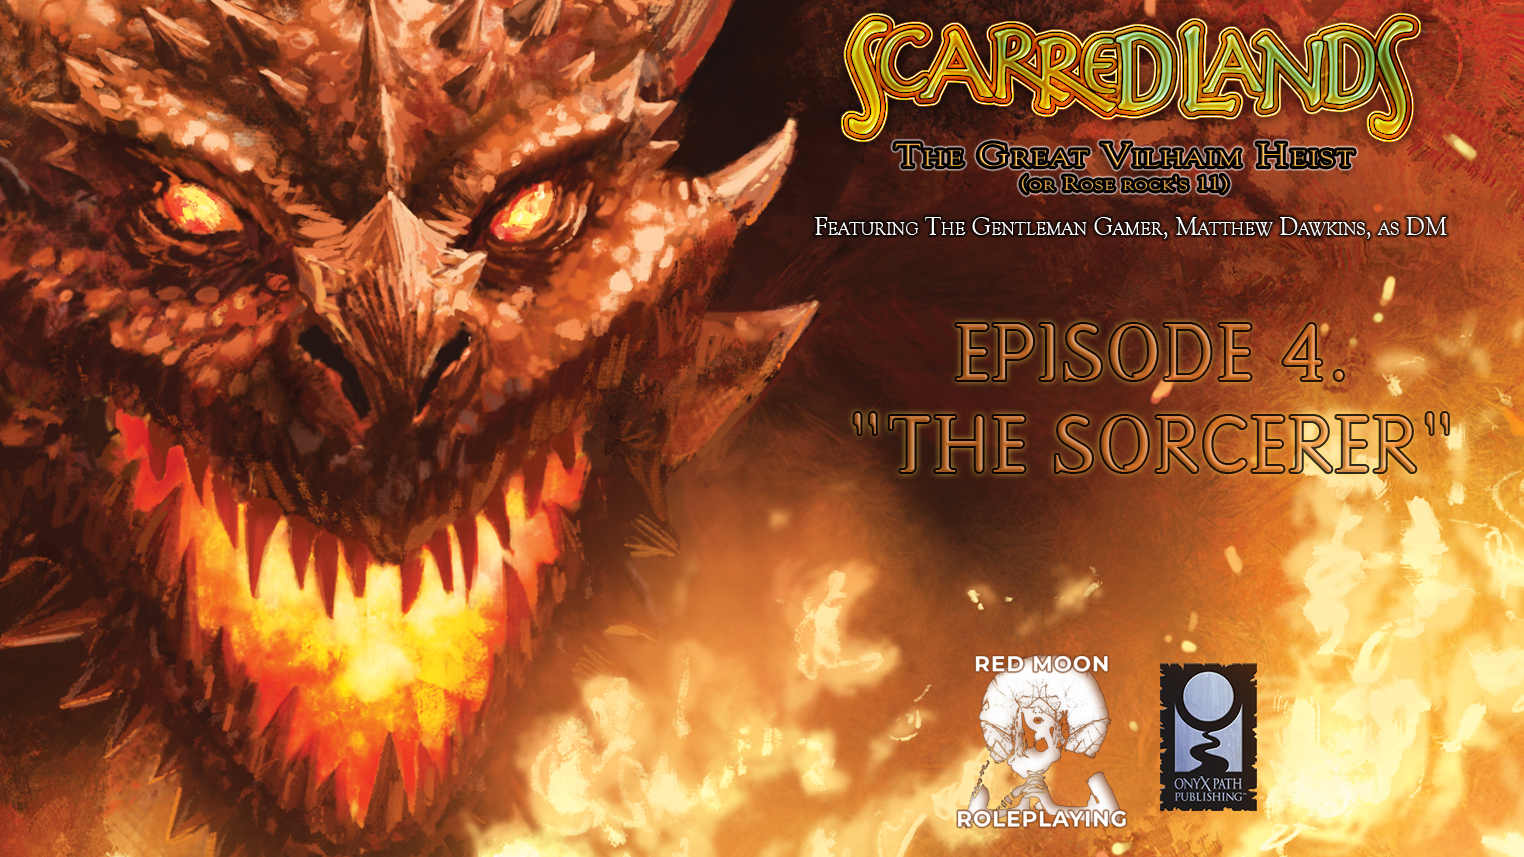 SCARRED_04.jpg